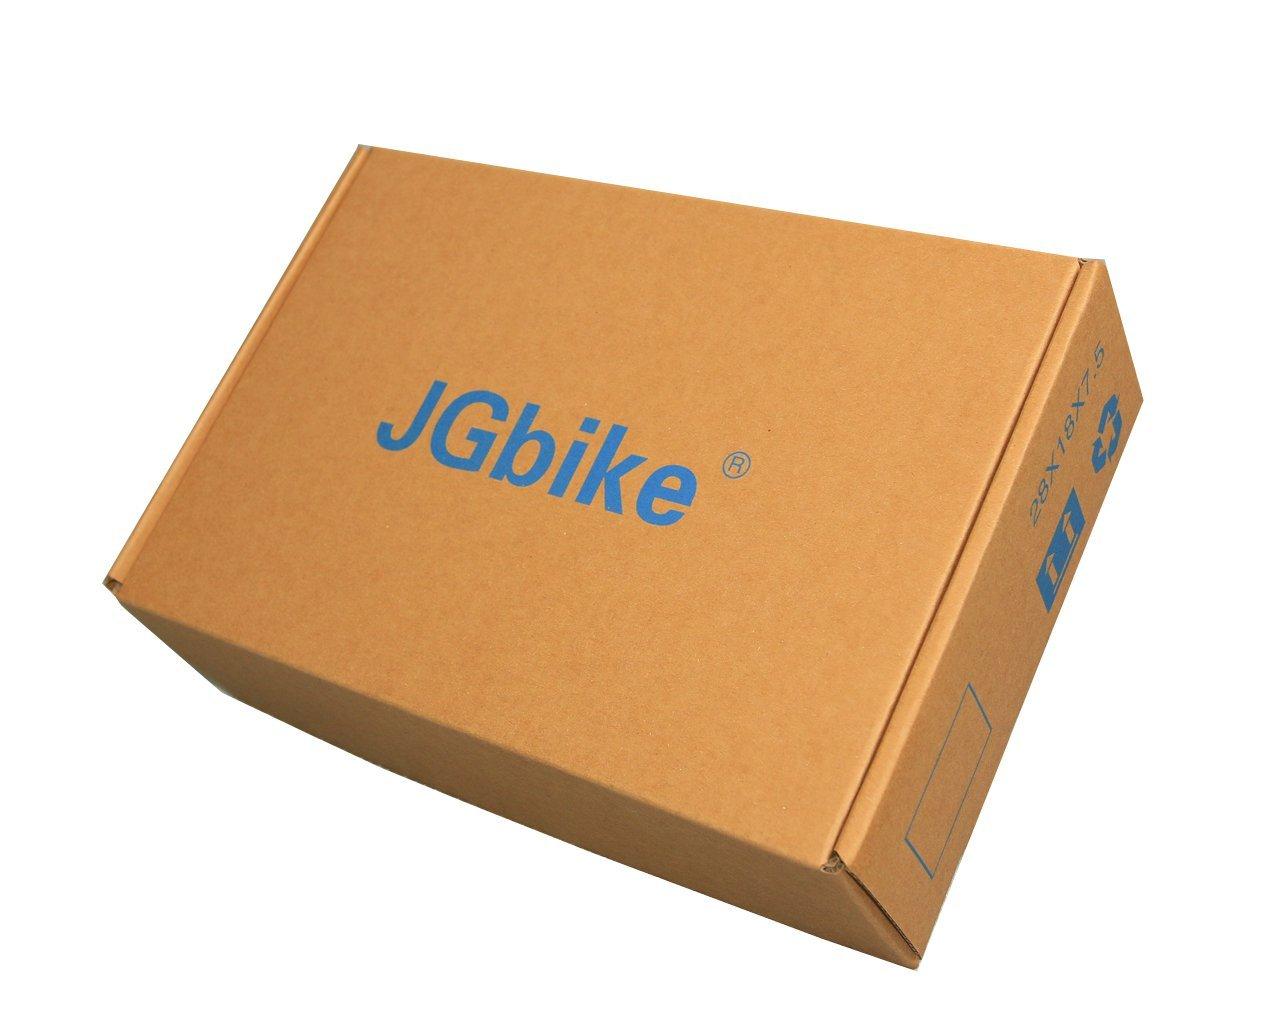 JGbike Shimano XT M8000 Brakes Set,MTB Hydraulic disc Brake Set, Including FIN, Resin Pads, MI 02 Adapter